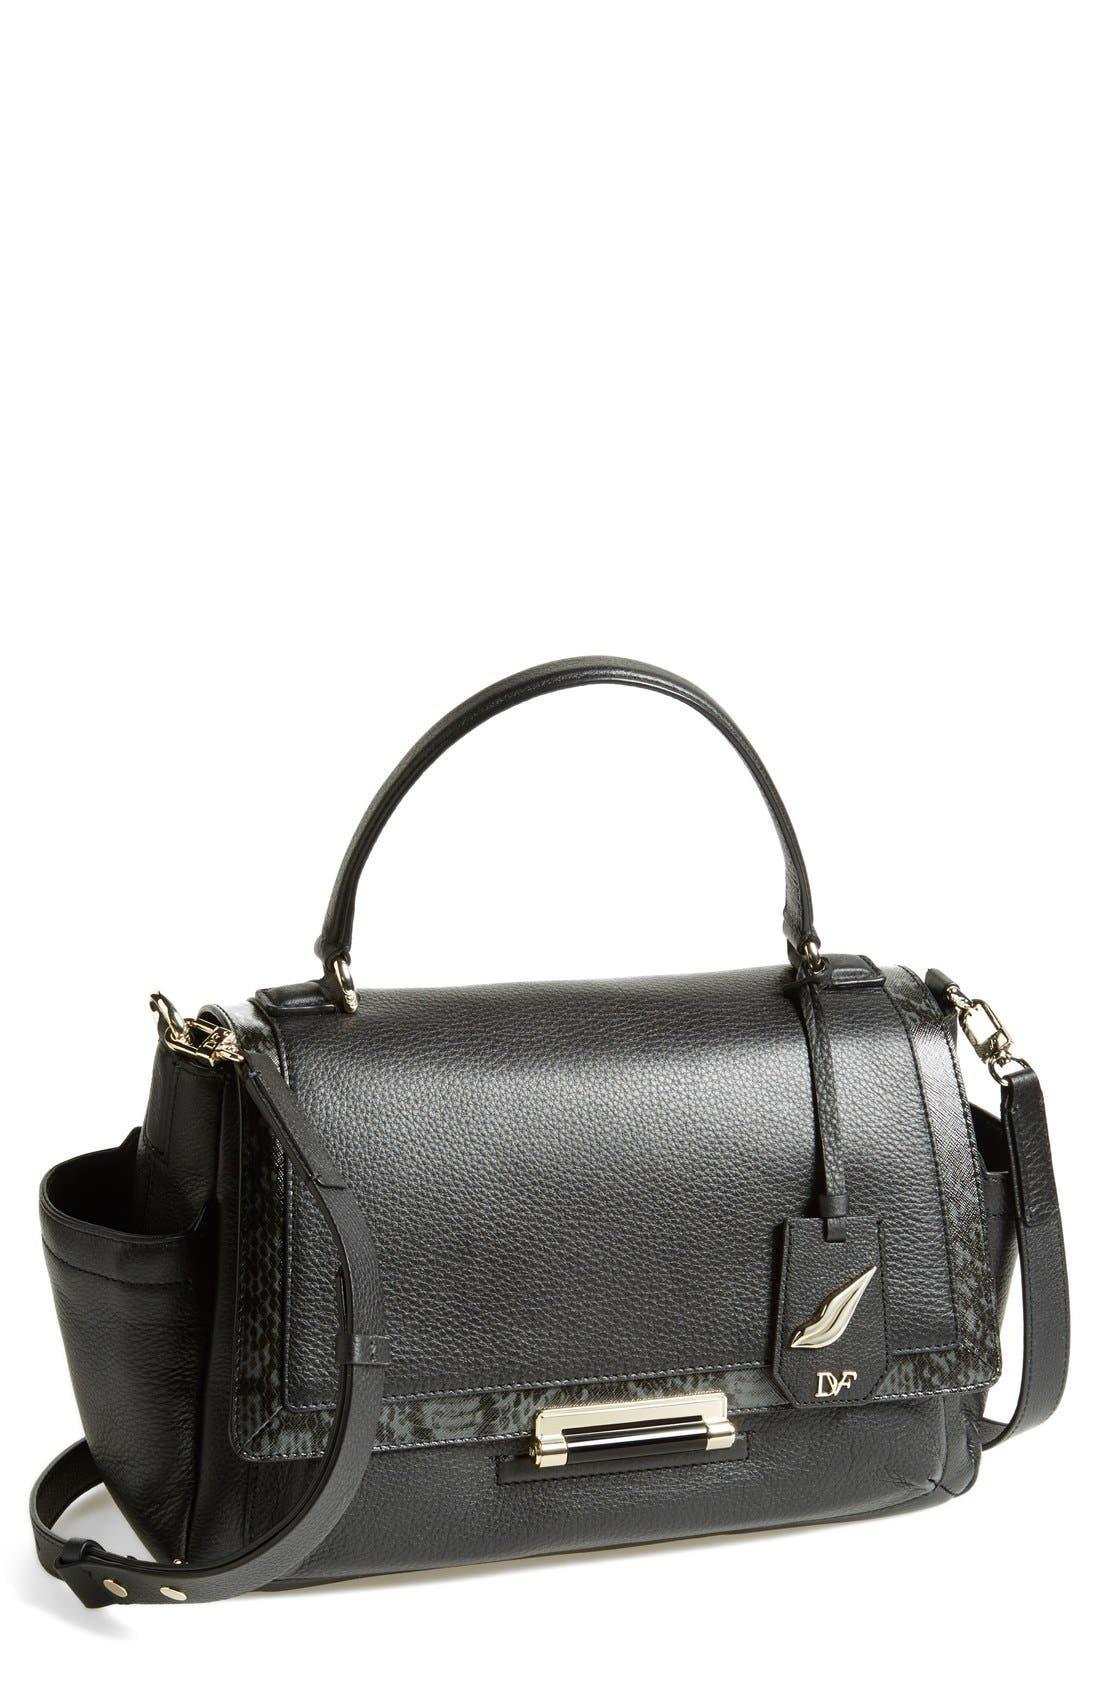 Alternate Image 1 Selected - Diane von Furstenberg '440 Courier' Leather Top Handle Satchel